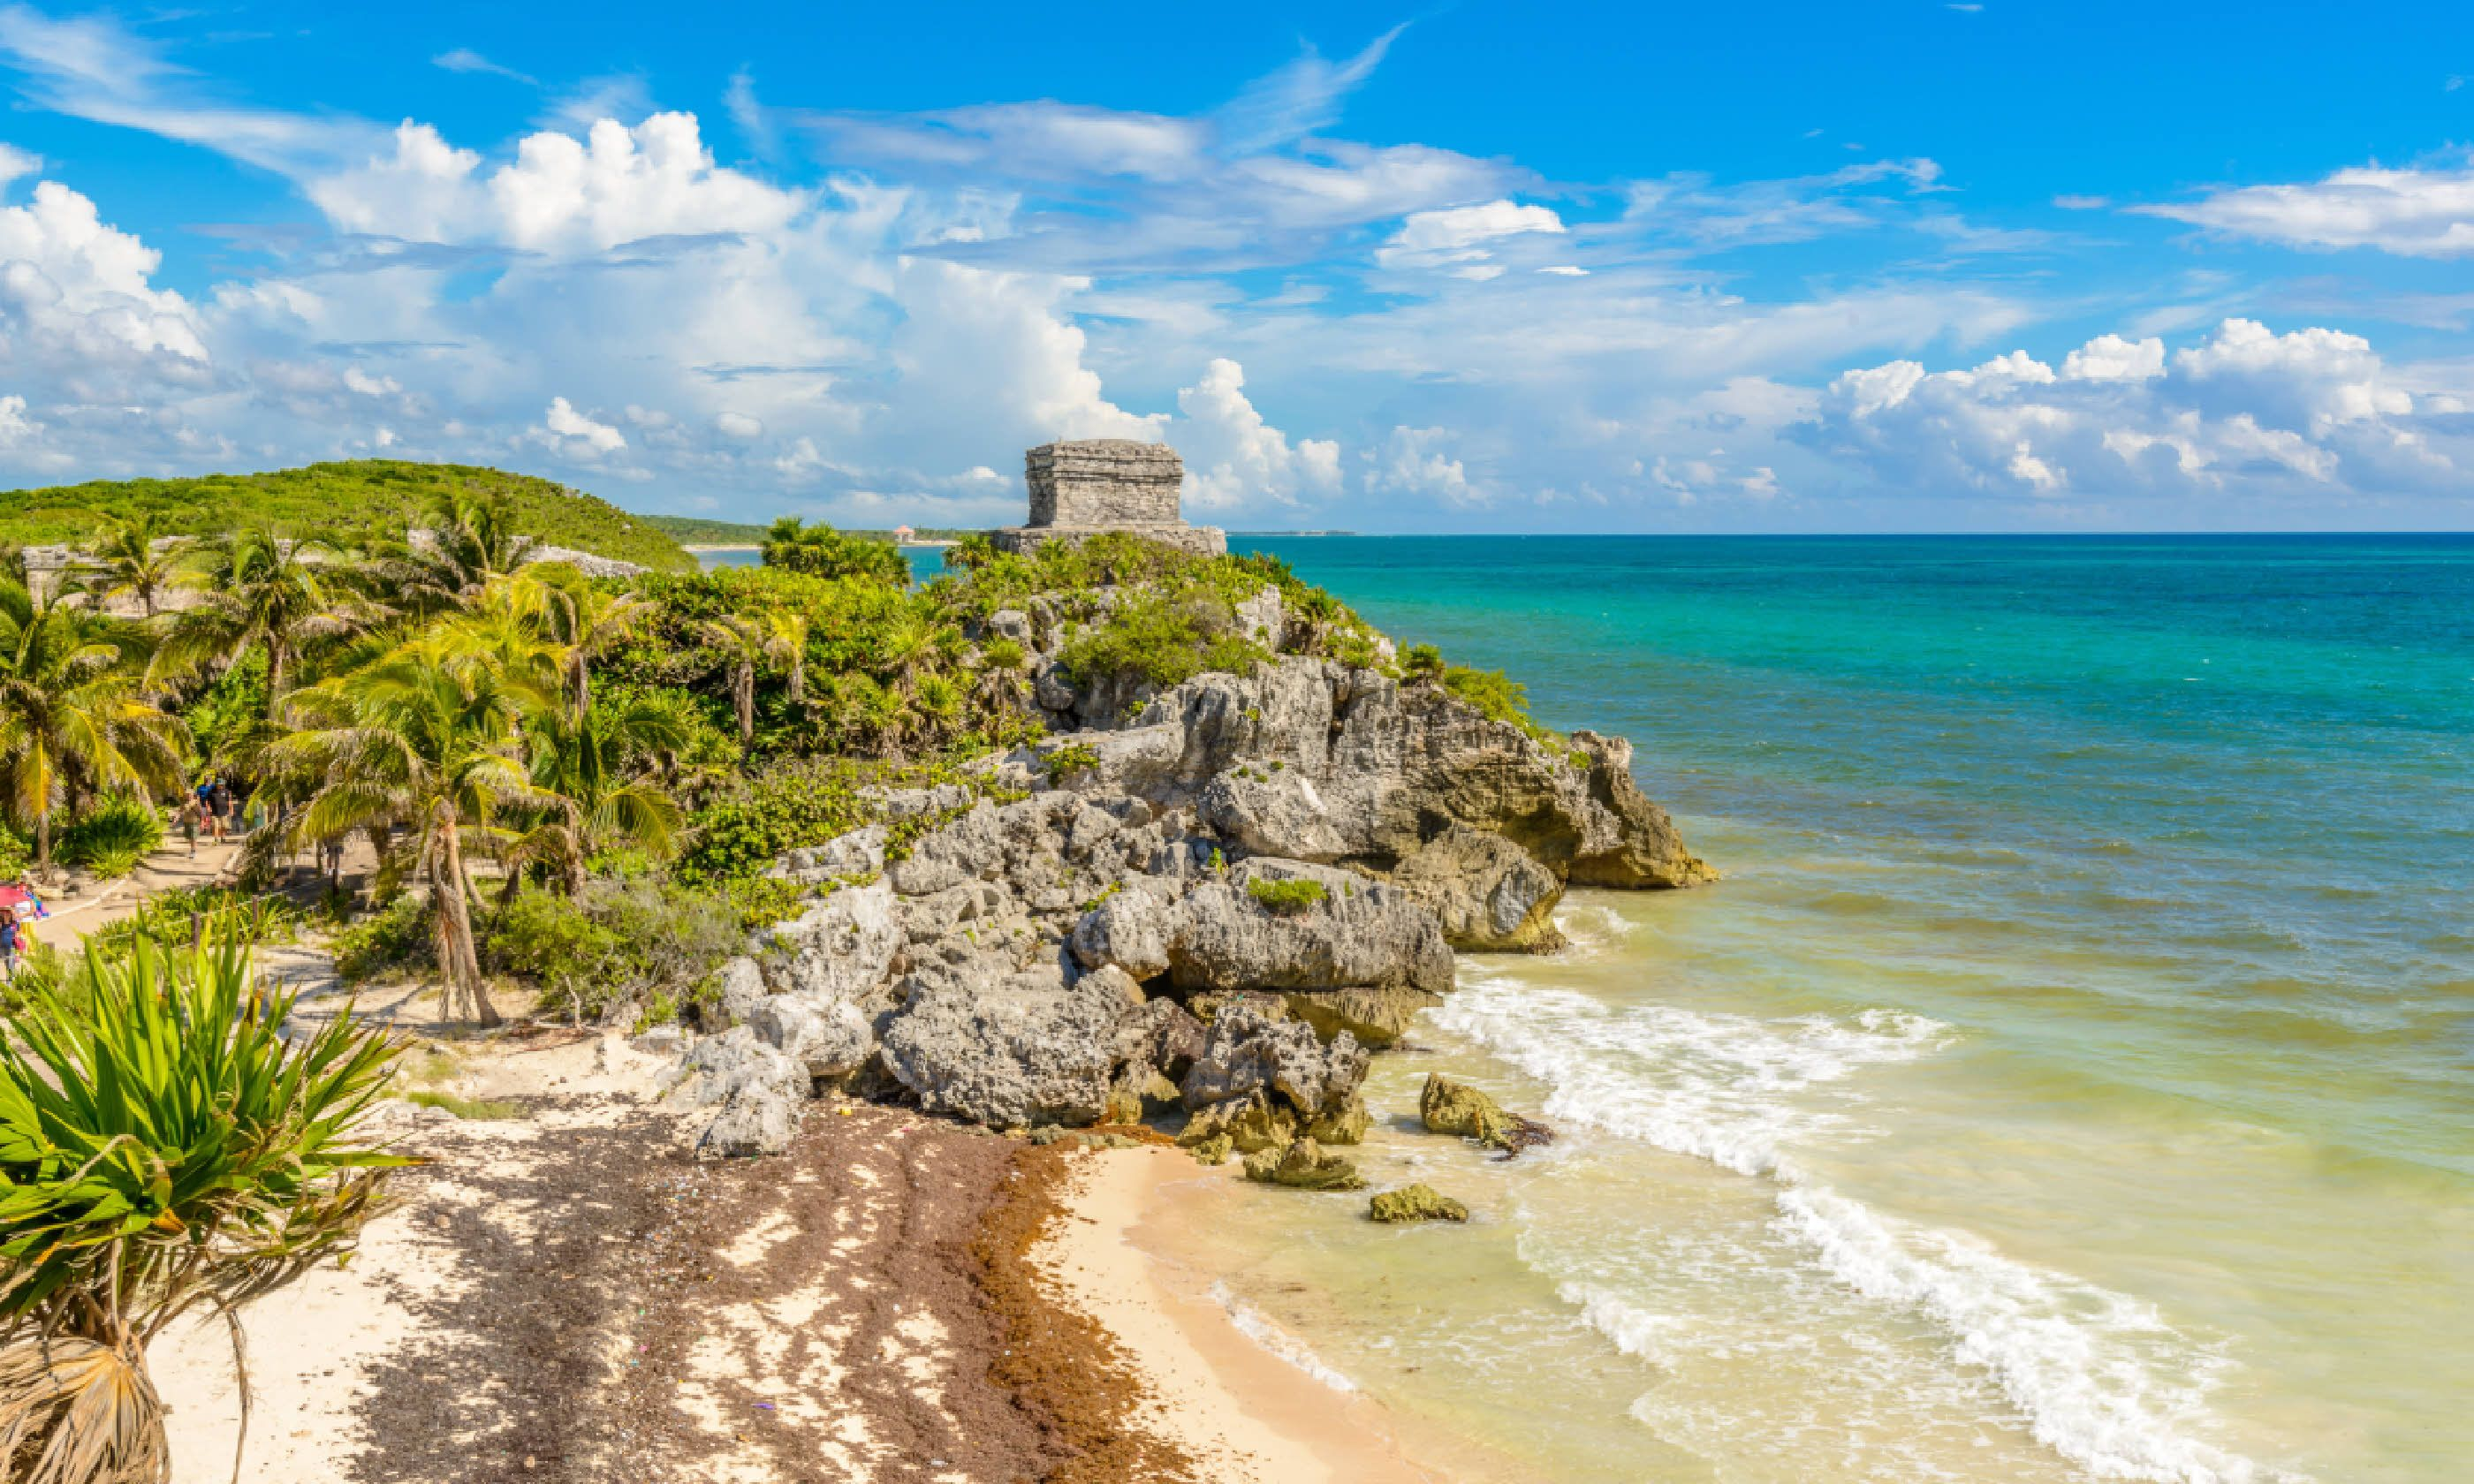 Mayan Ruins of Tulum (Shutterstock)